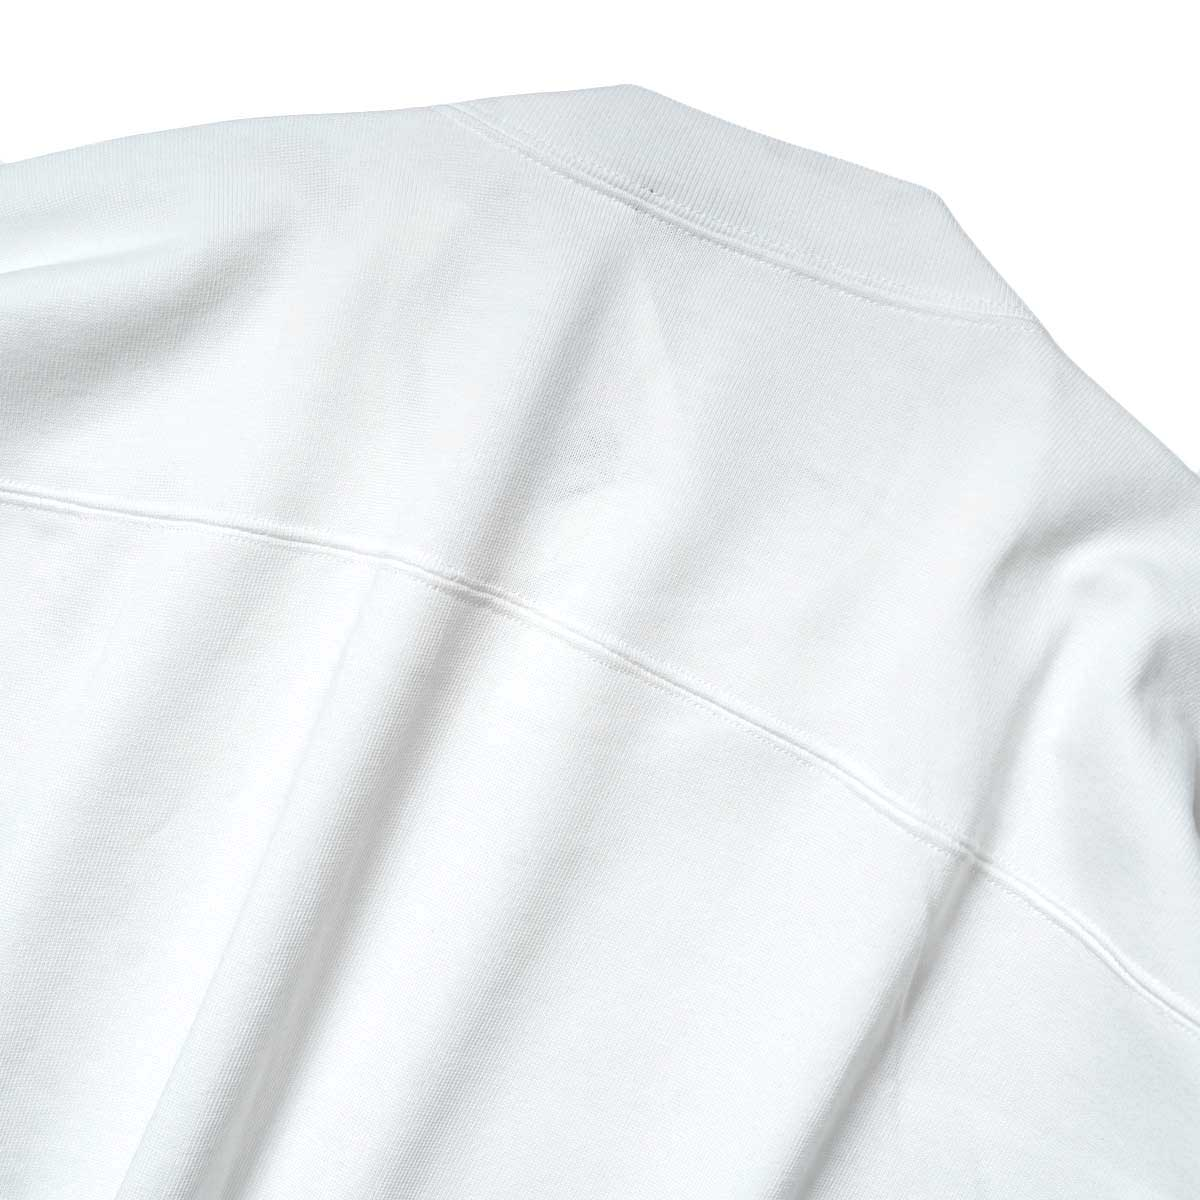 YLEVE / TWIST YARN COTTON BIG P/O (White) 背面アップ